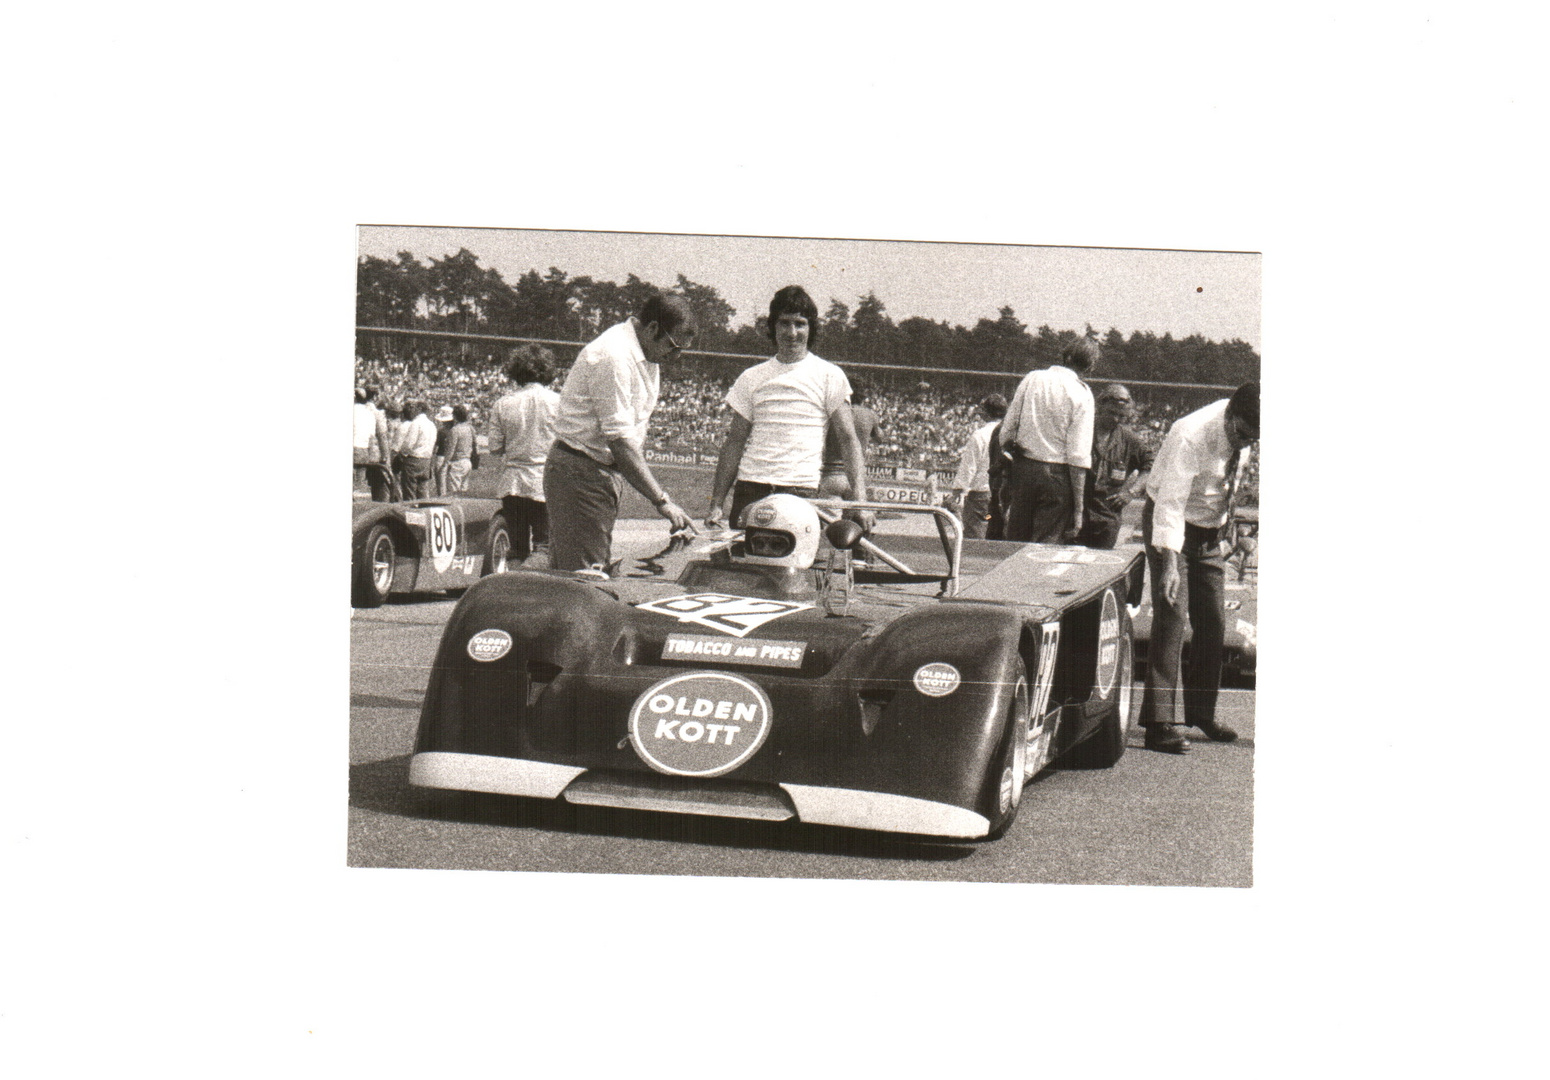 Clemens Schickentanz Chevron B 21 Dahl-Kanal gesponsort Norisring 1971